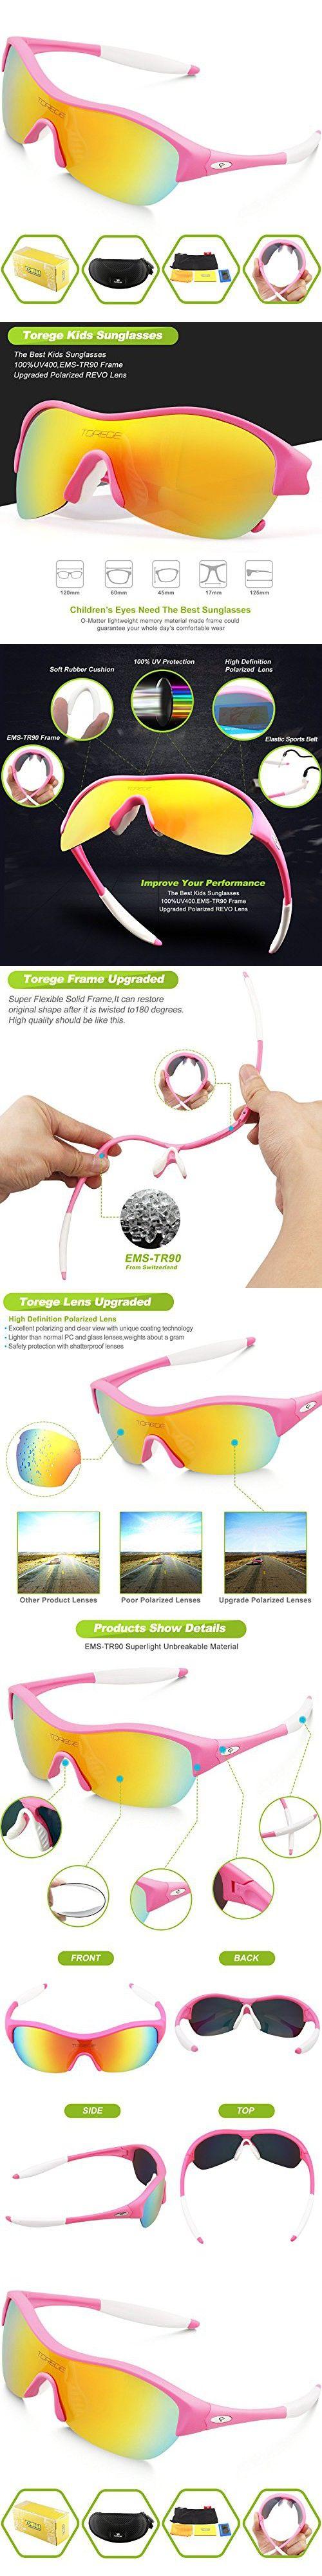 683f8b2caa57 Torege Tr90 Flexible Kids Sports Sunglasses Polarized Glasses for Boys  Girls Age 3-15 Trk001 (White blue)